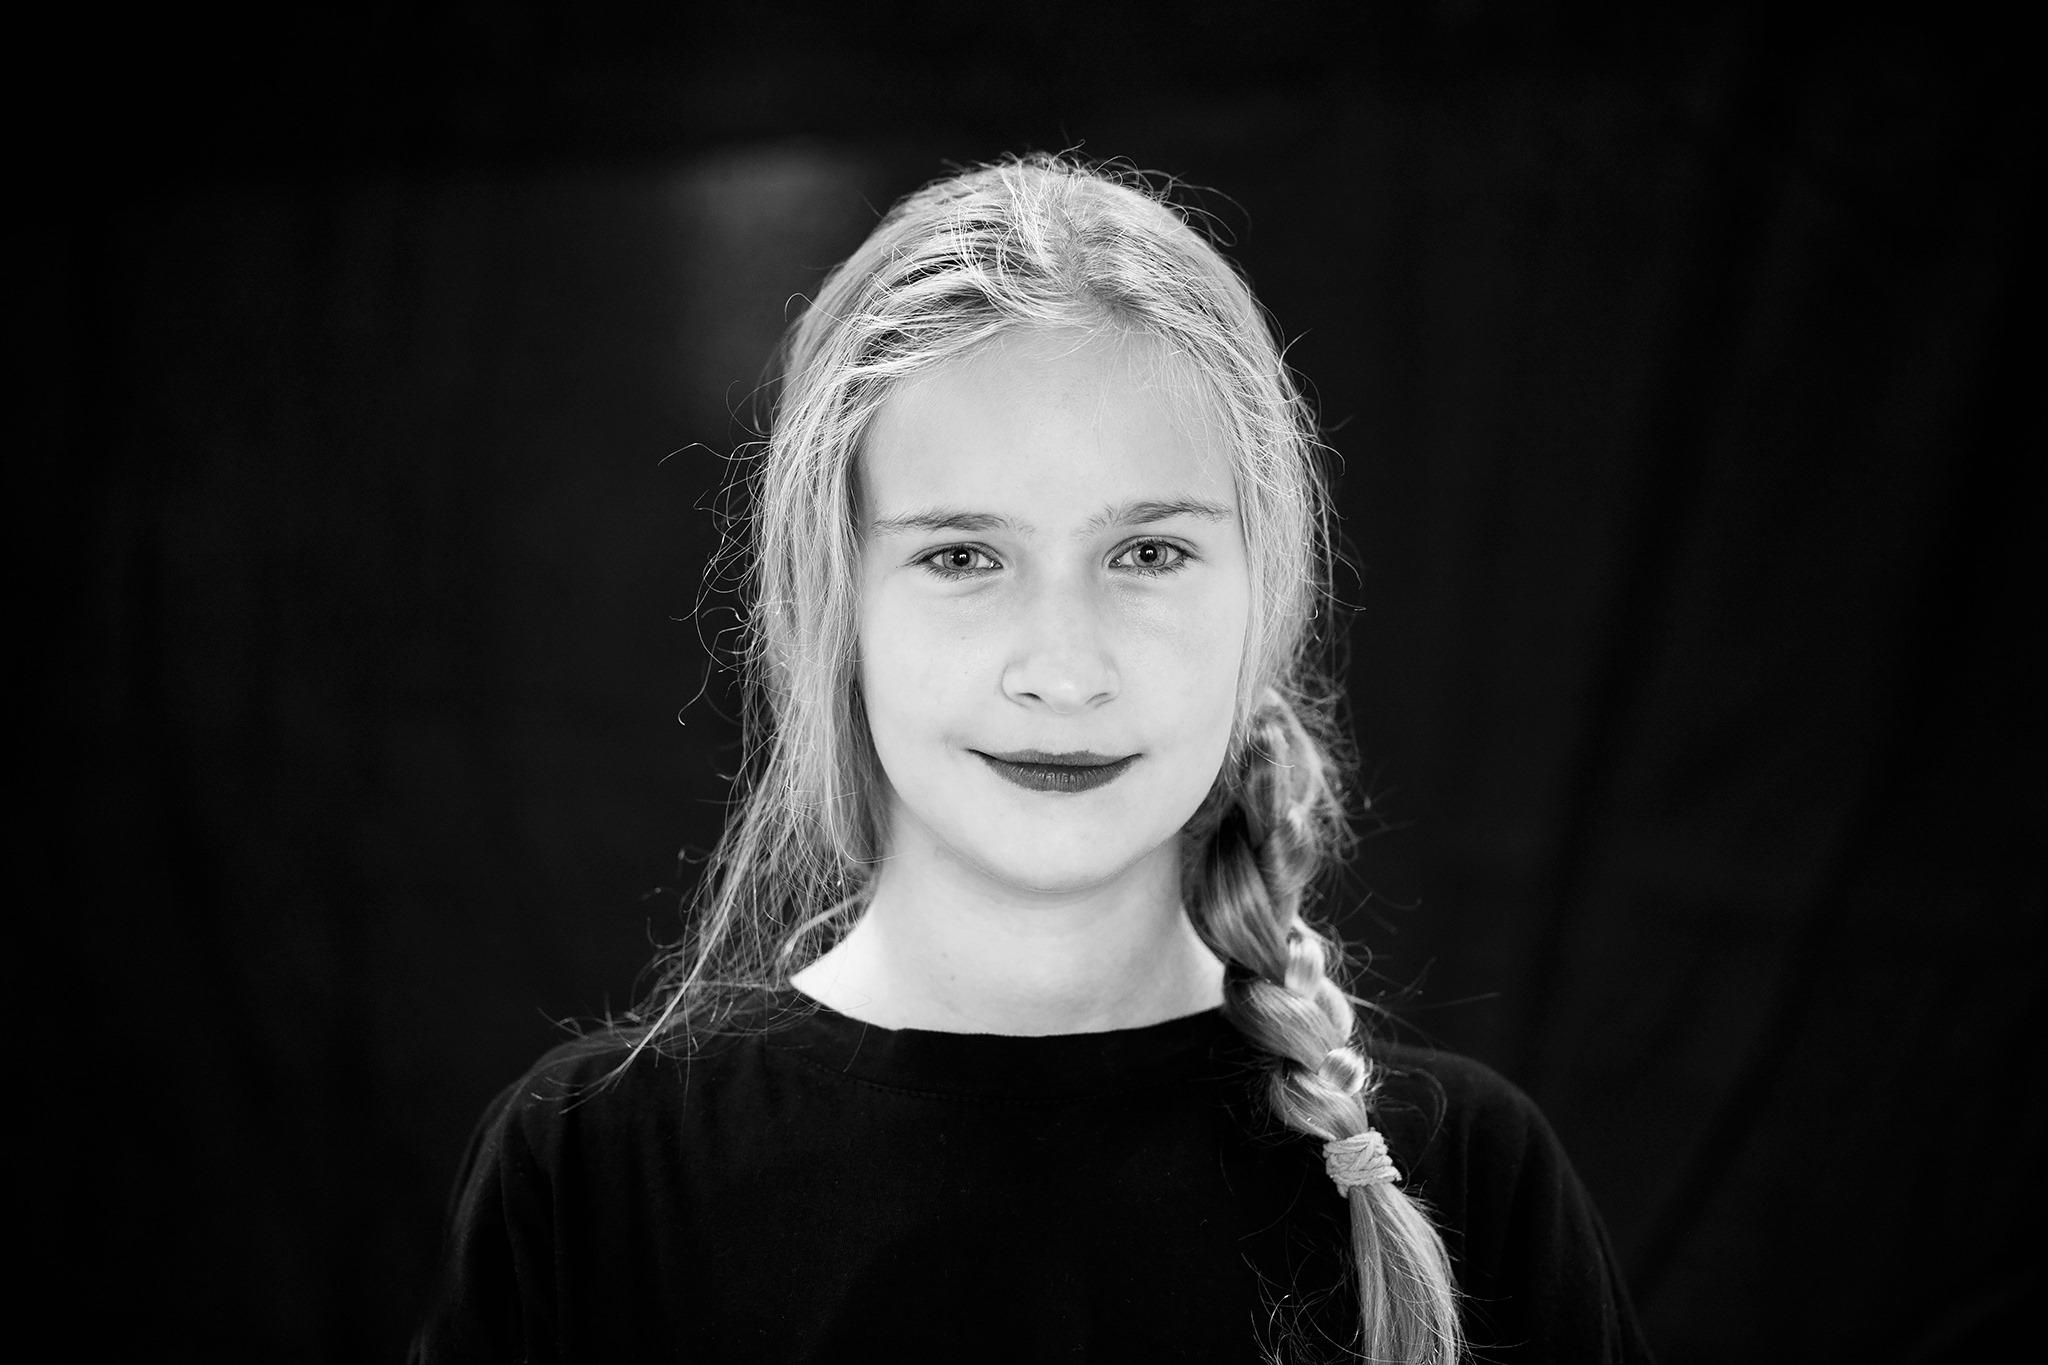 Hanička Malastová